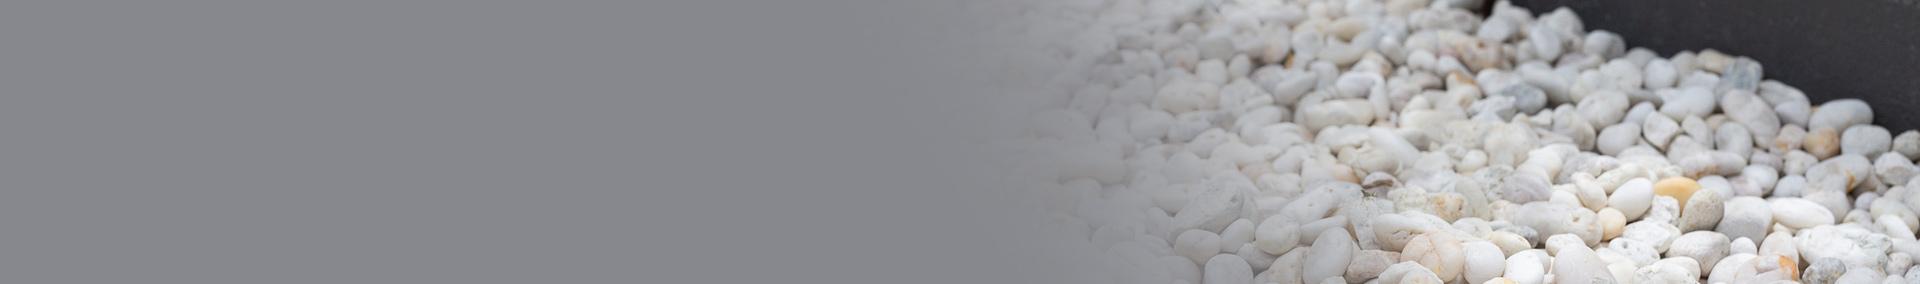 baner otoczaki